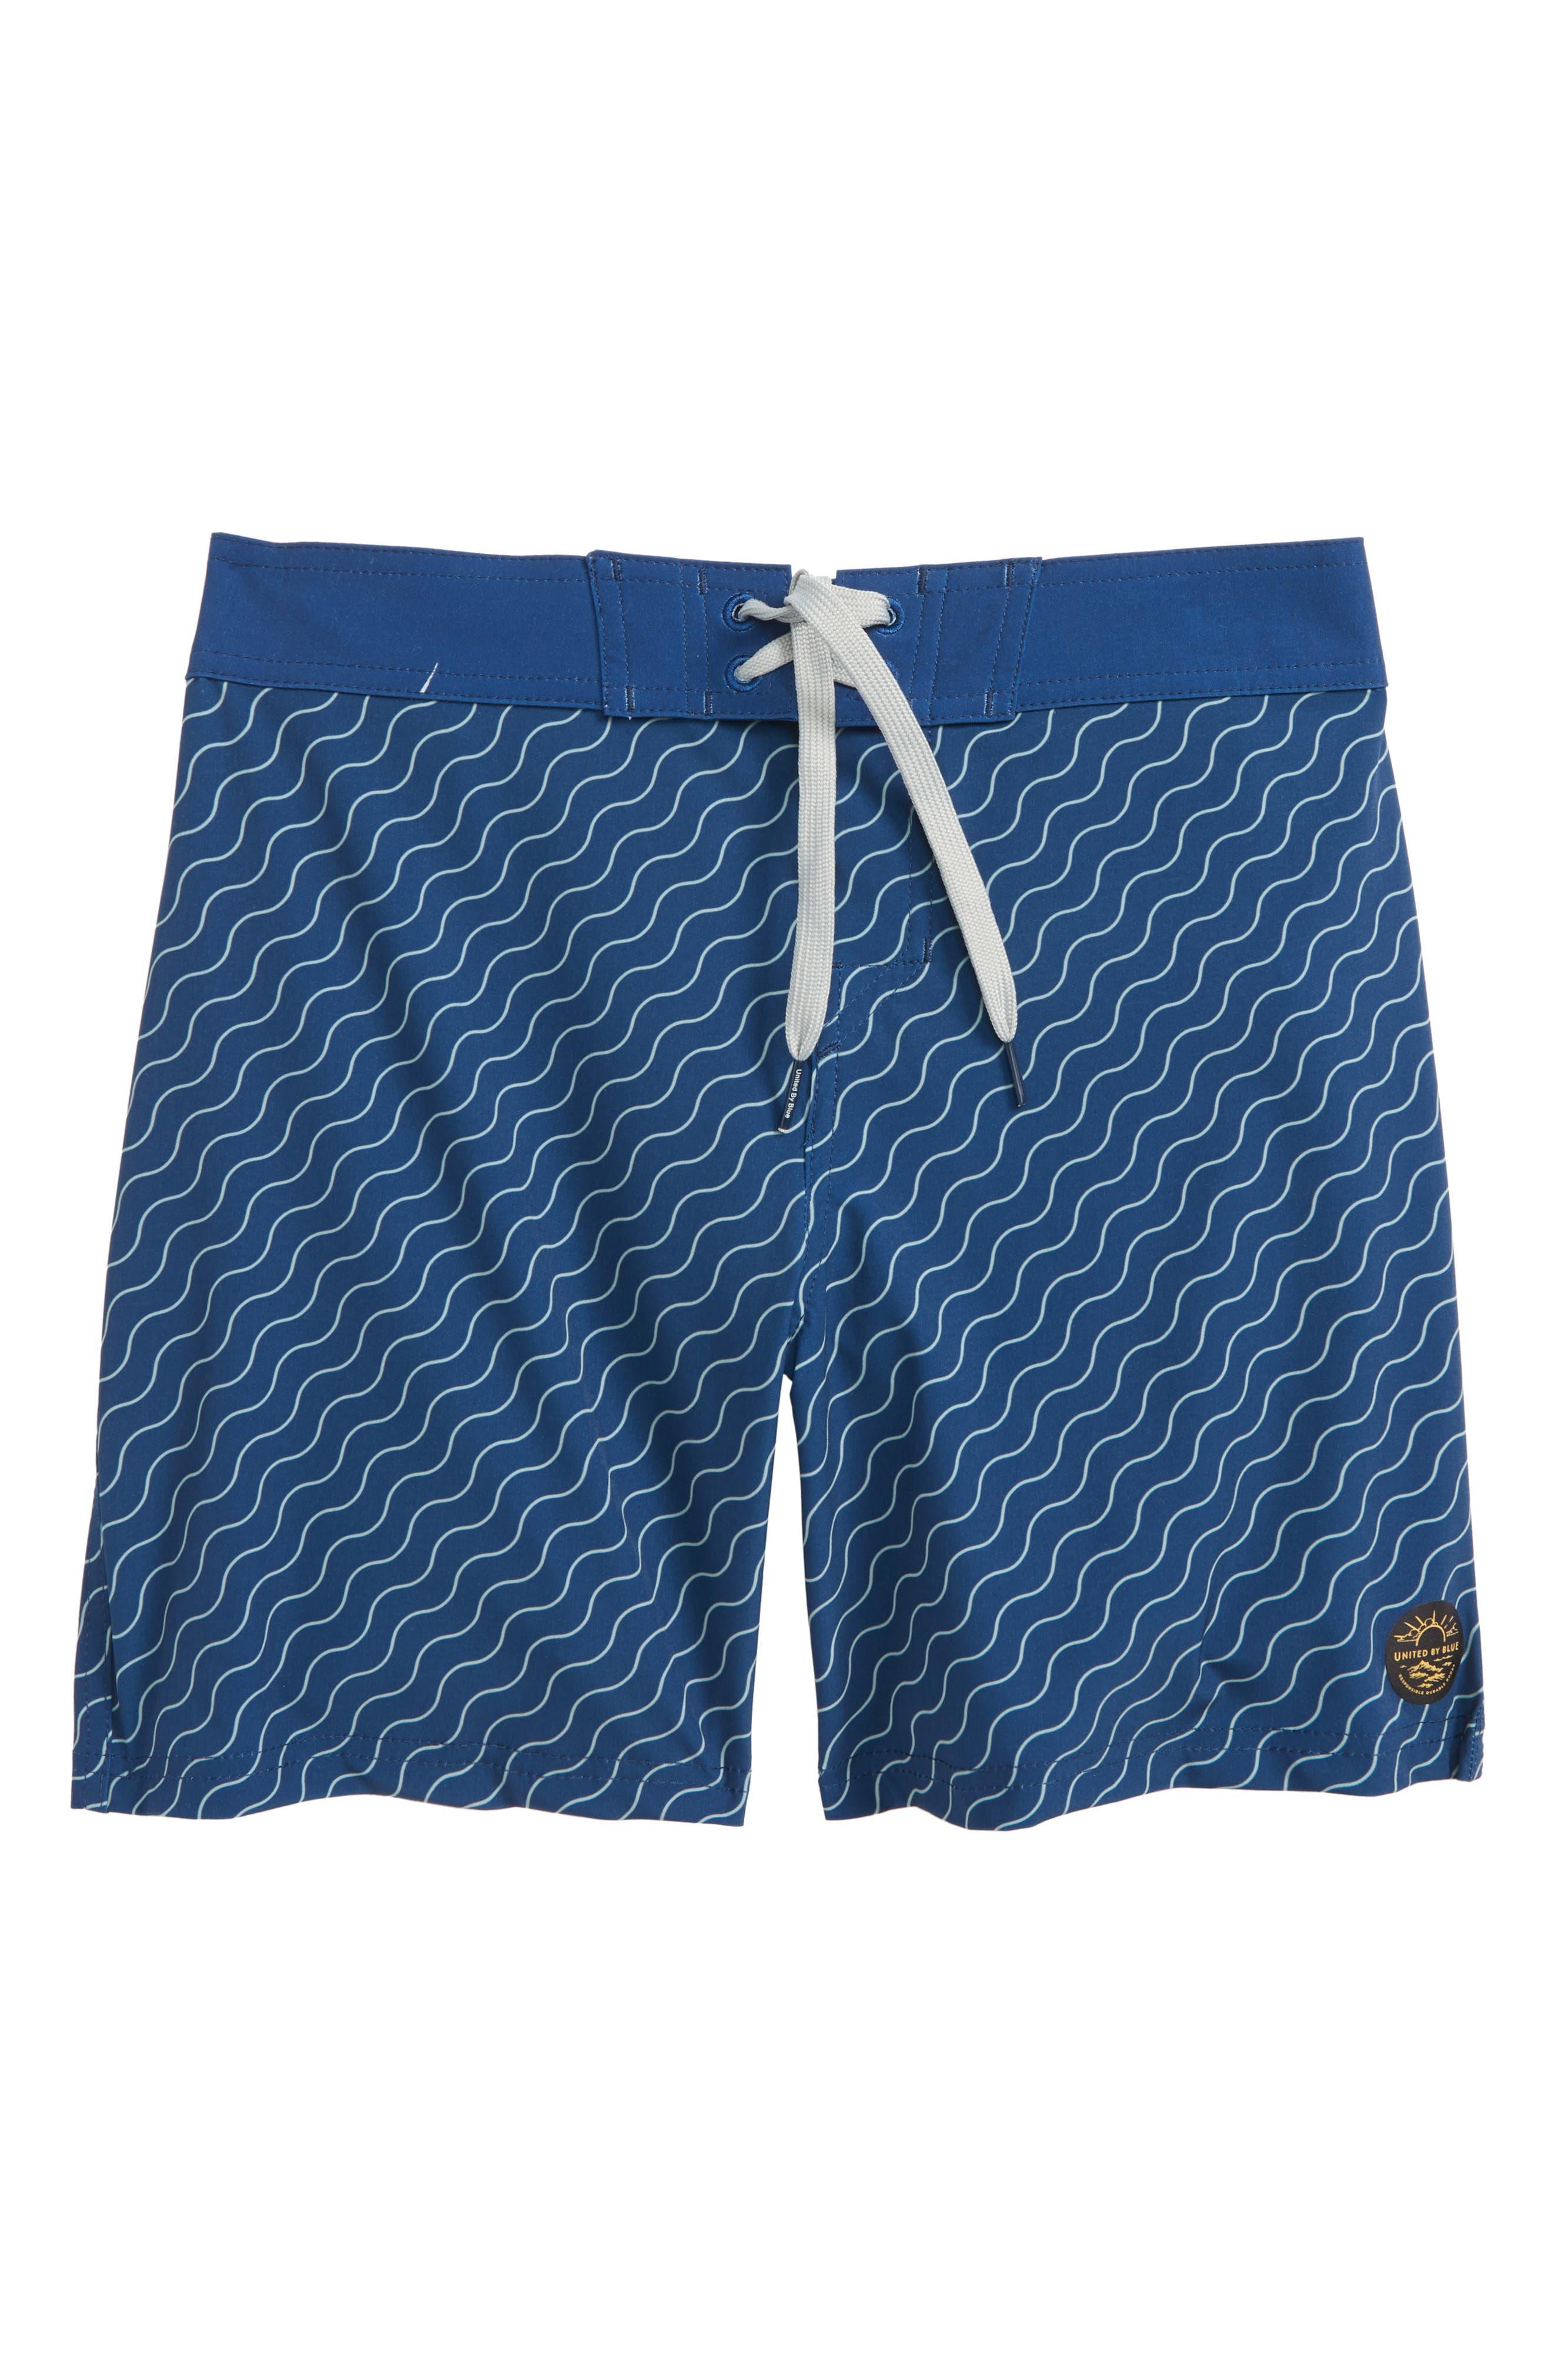 Stillwater Board Shorts,                             Main thumbnail 1, color,                             410